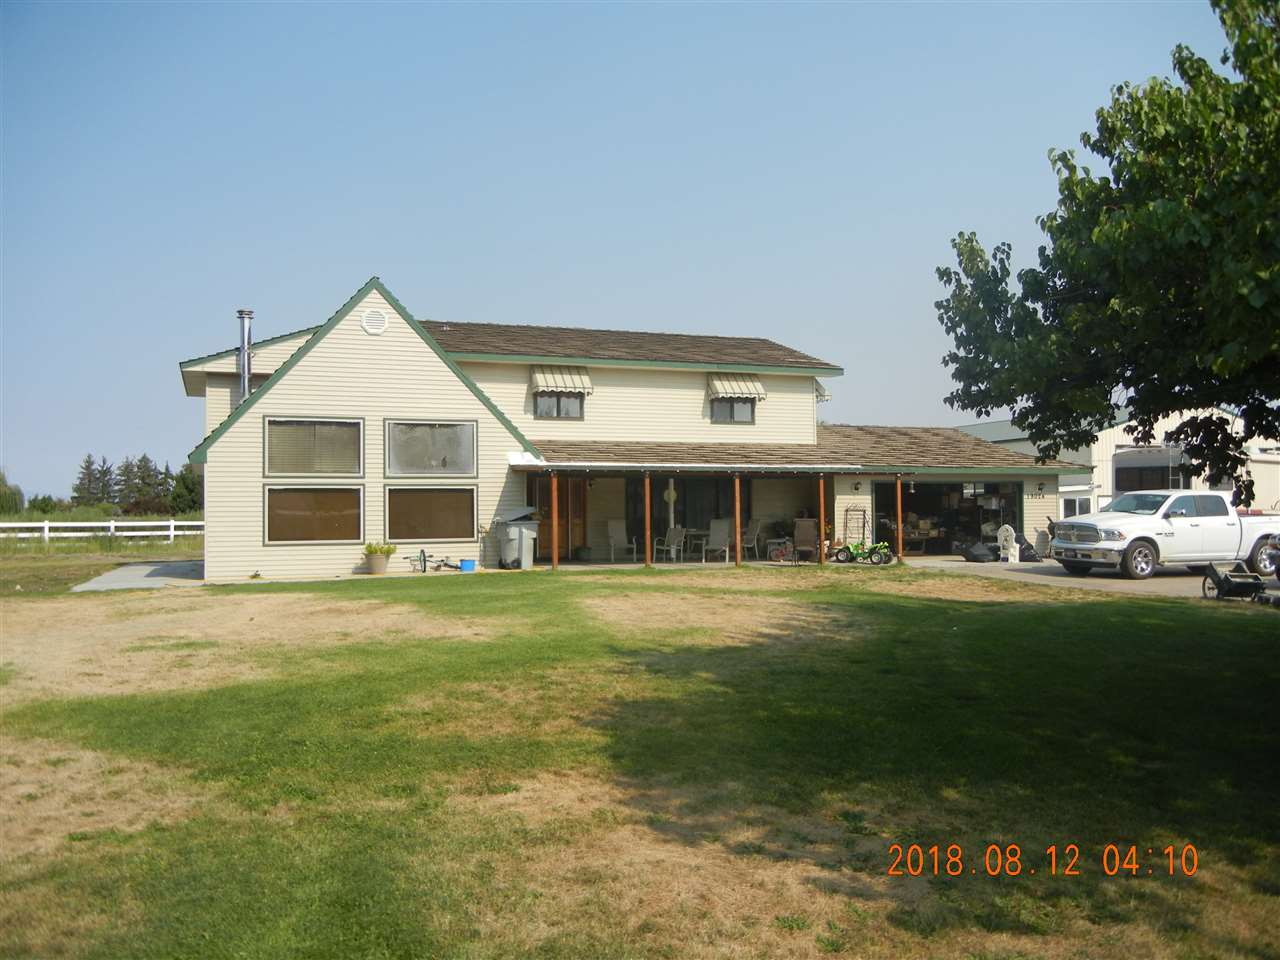 19024 Midland Blvd, Nampa ID 83687